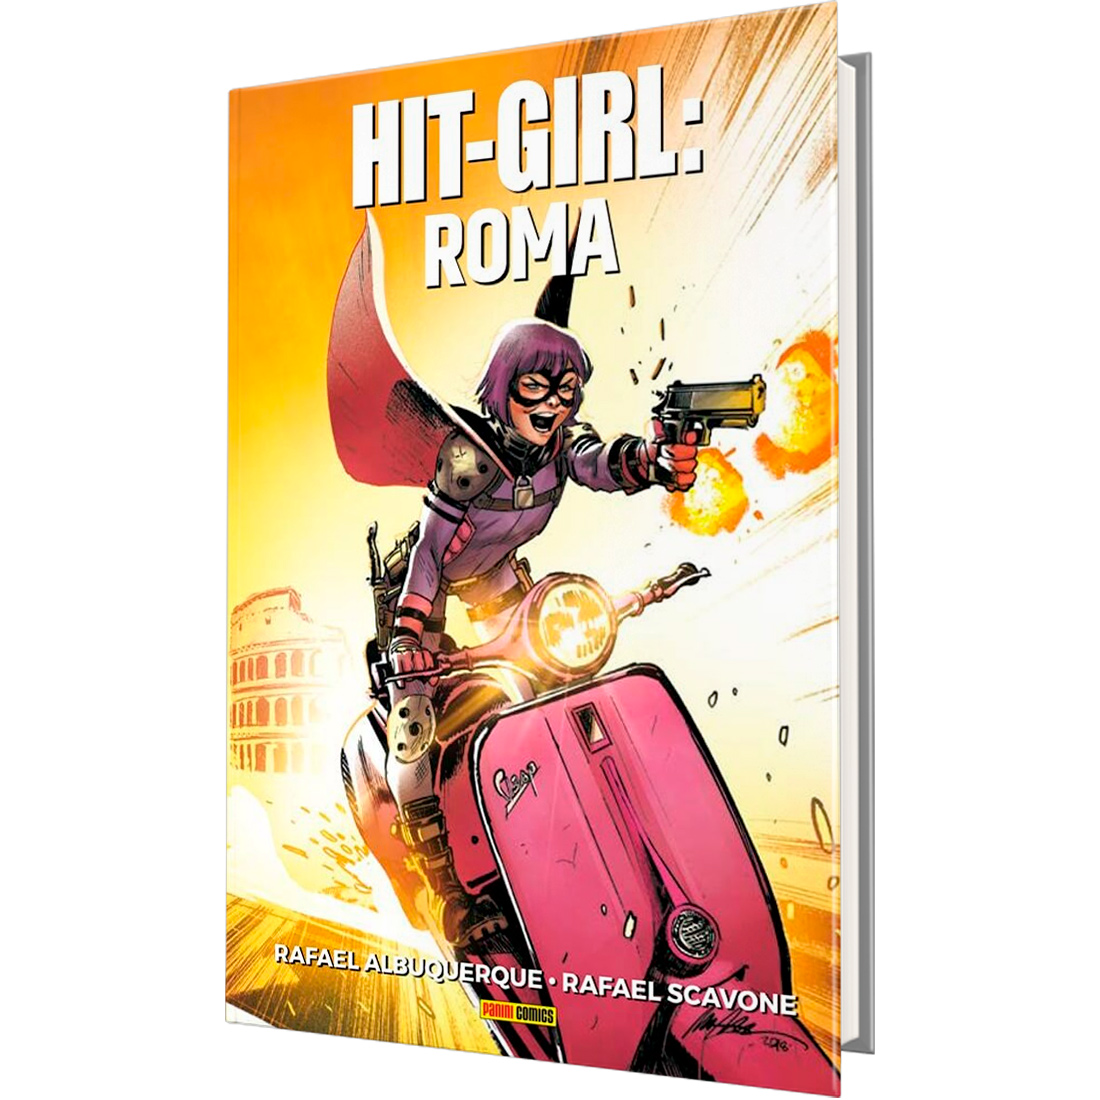 Hit-Girl Vol. 3 - Roma